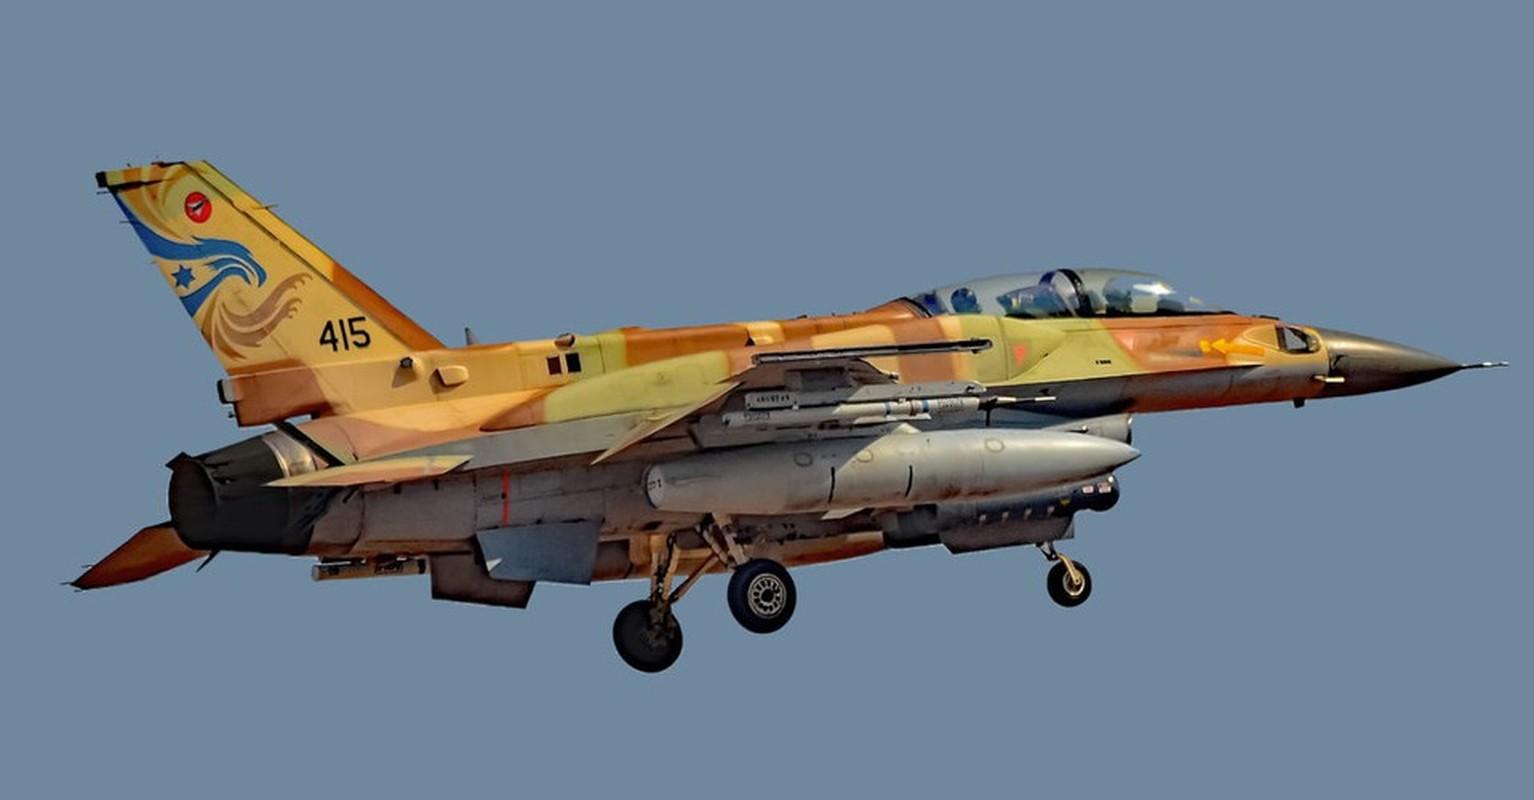 Khong quan Israel khong kich du doi, them mot lan Syria chiu tran cay dang-Hinh-3